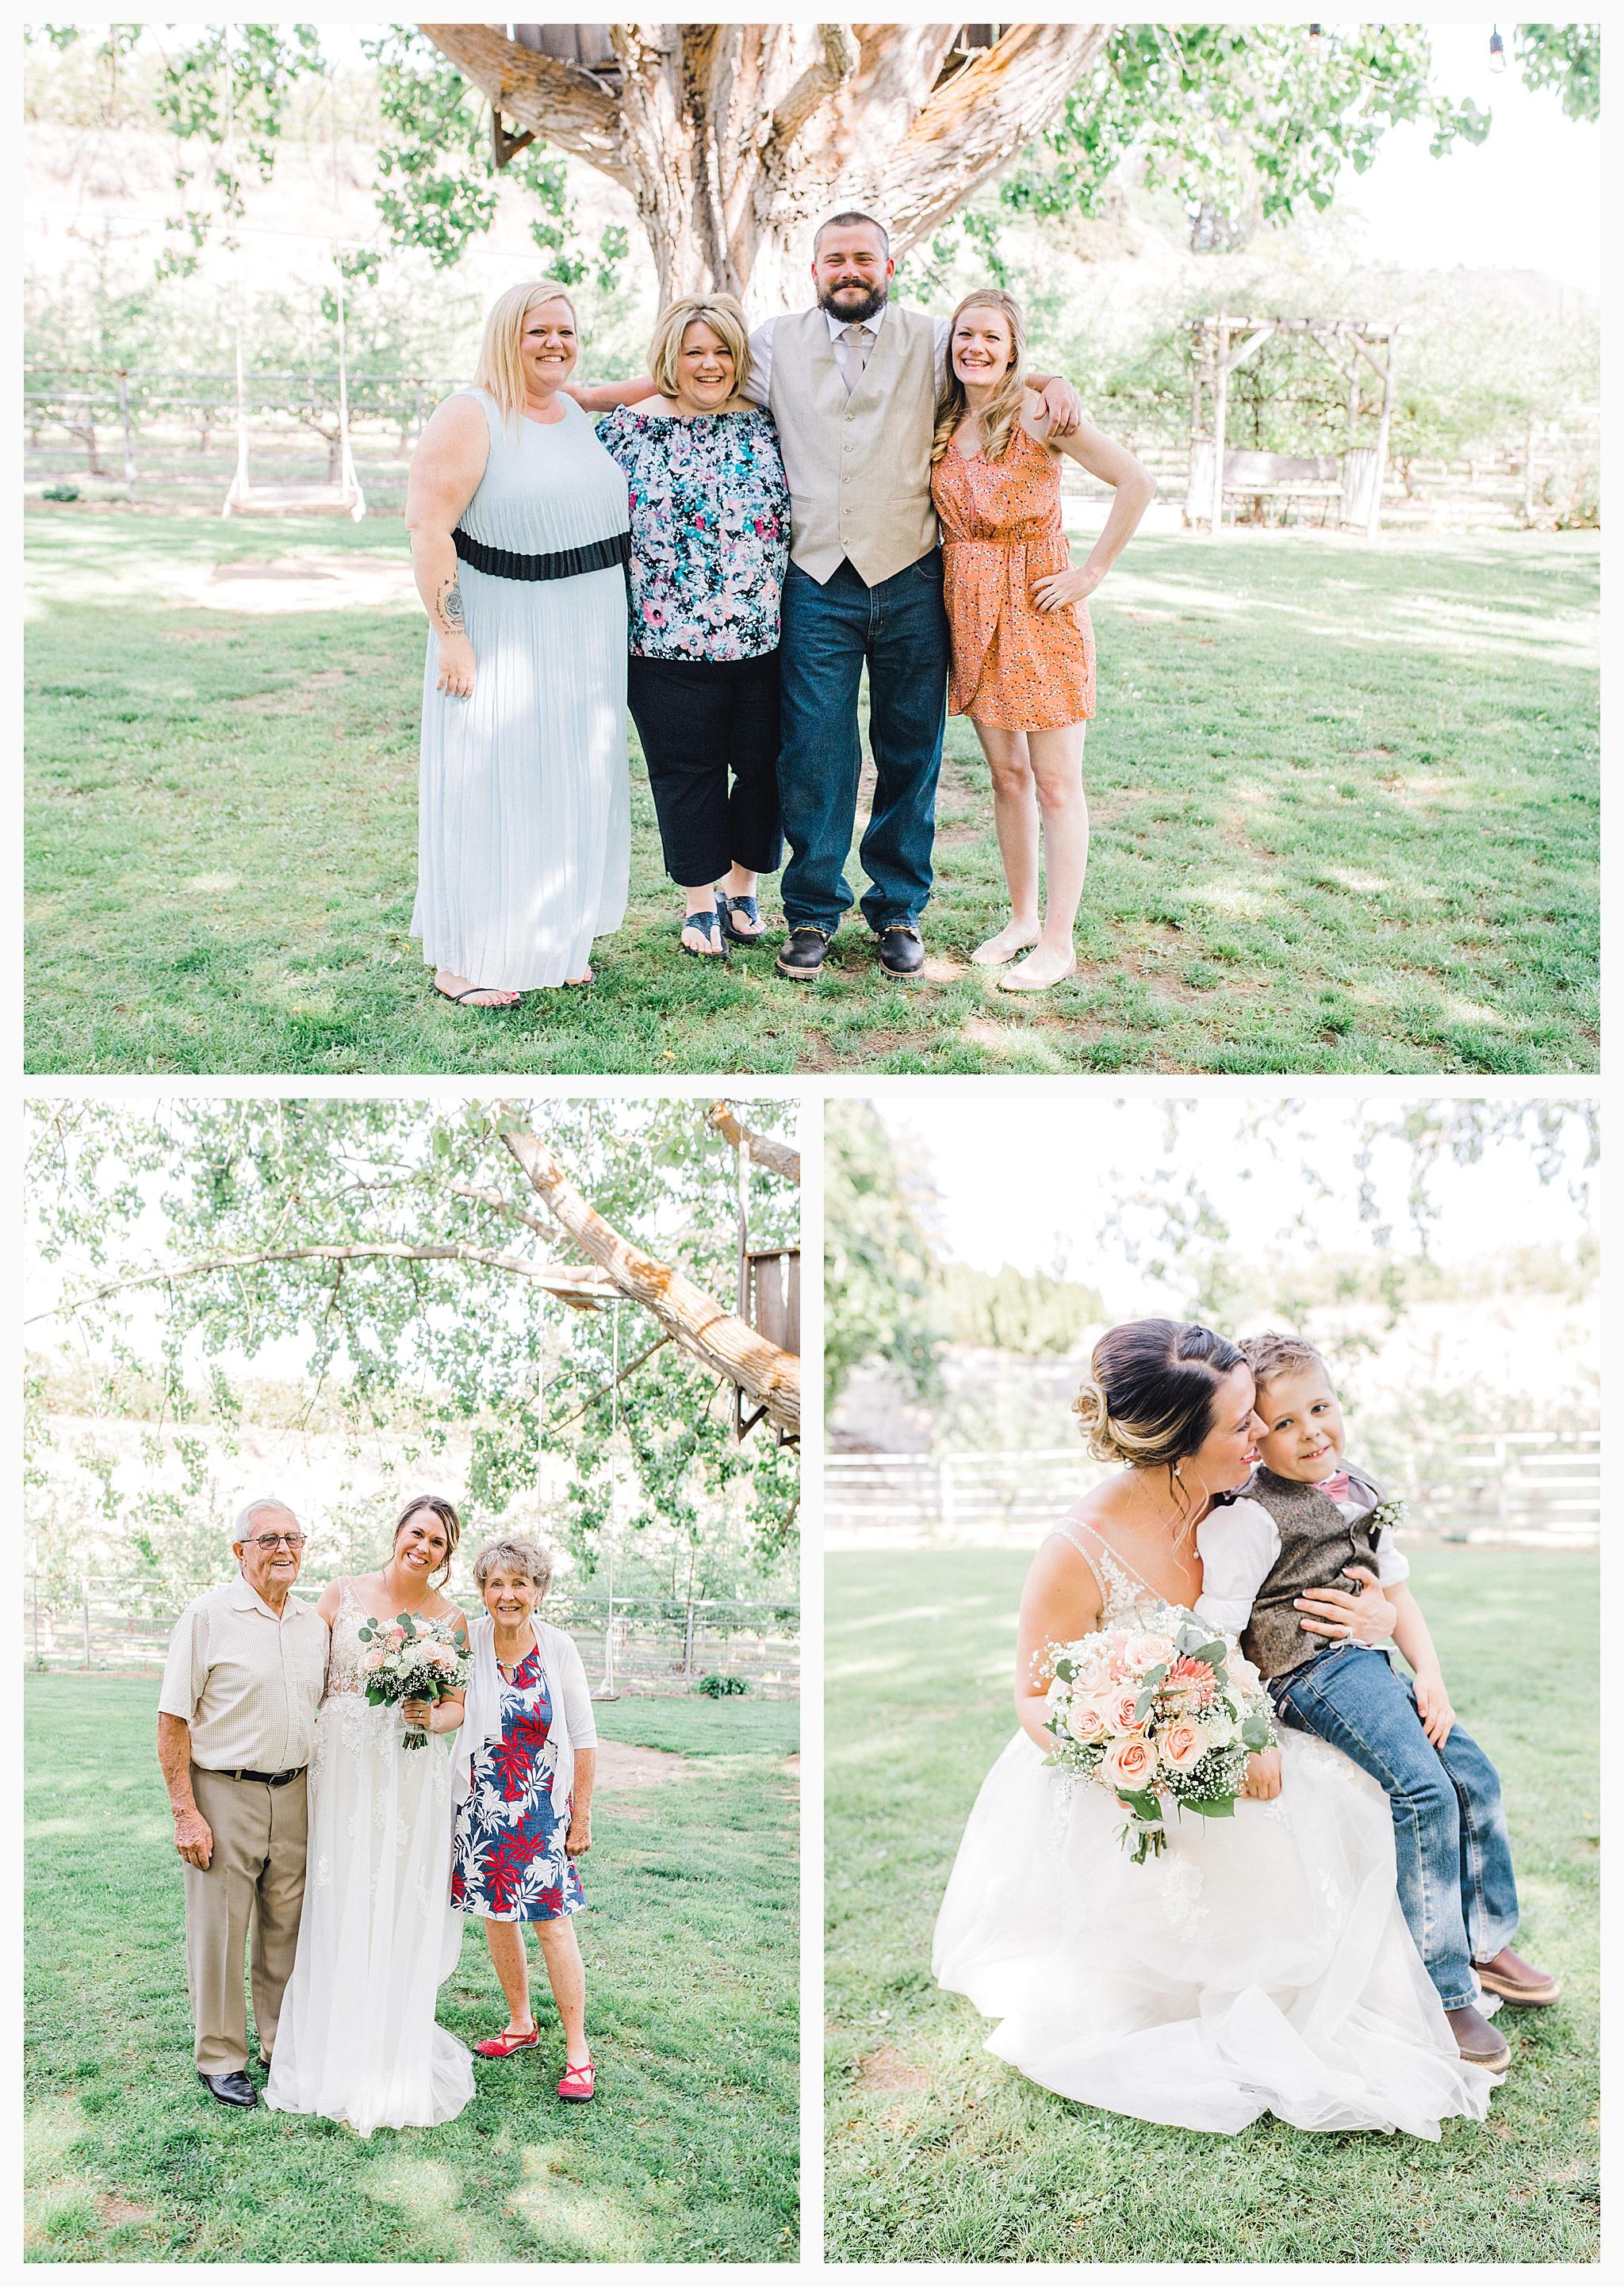 Rustic barn wedding in Wenatchee Washington at Sunshine Ranch on Easy Street, Emma Rose Company Seattle PNW Light and Airy Wedding Photographer_0074.jpg